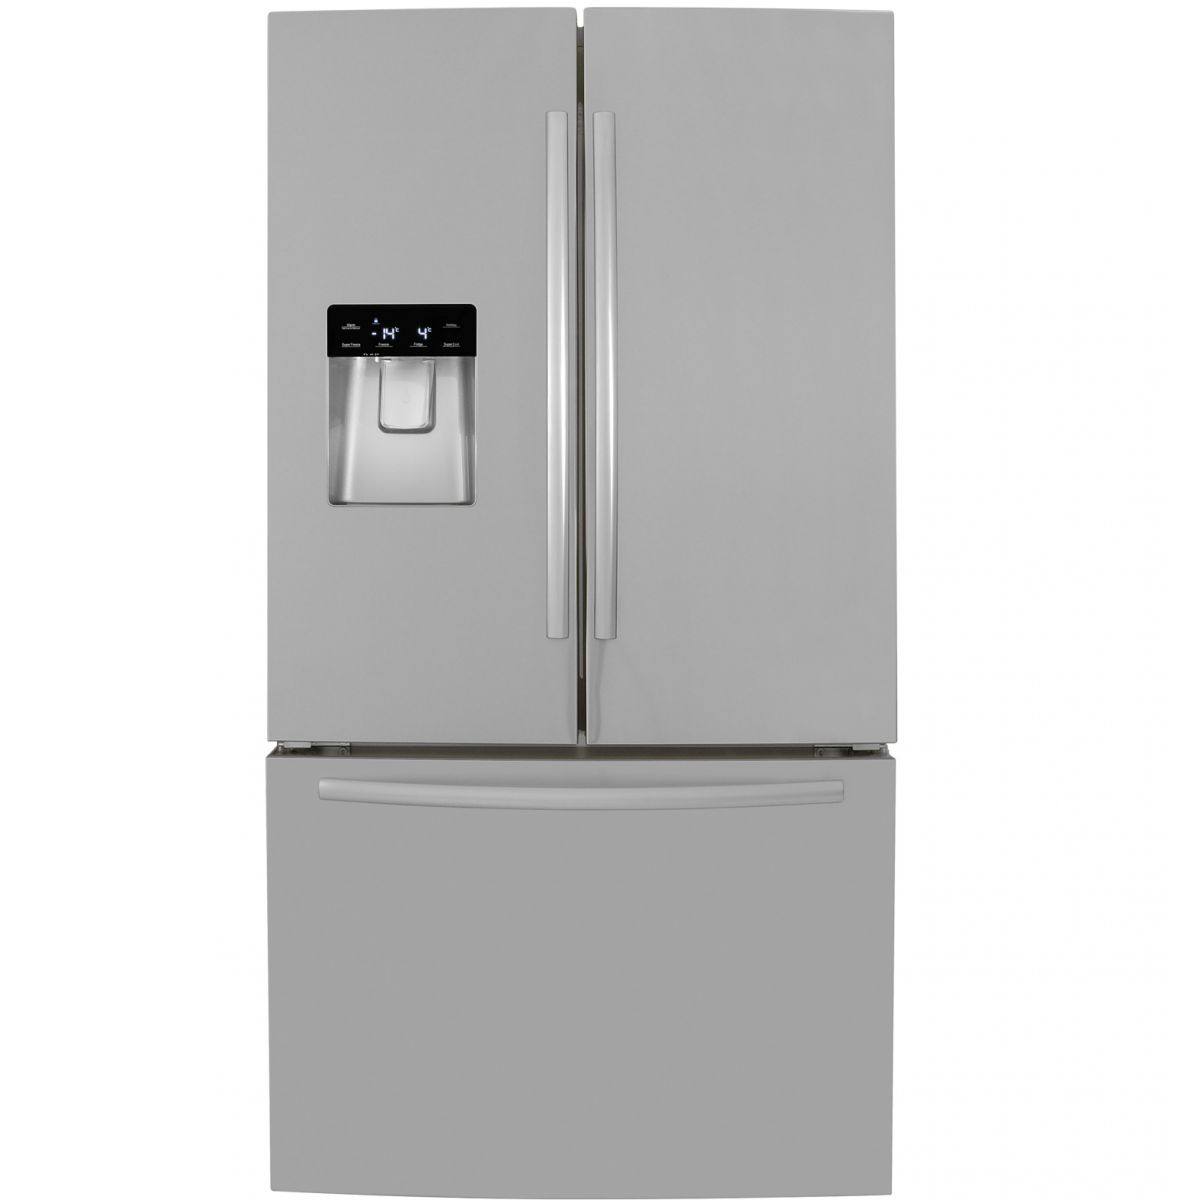 Refrigerador French Door FD 600 X2 531L Elettromec